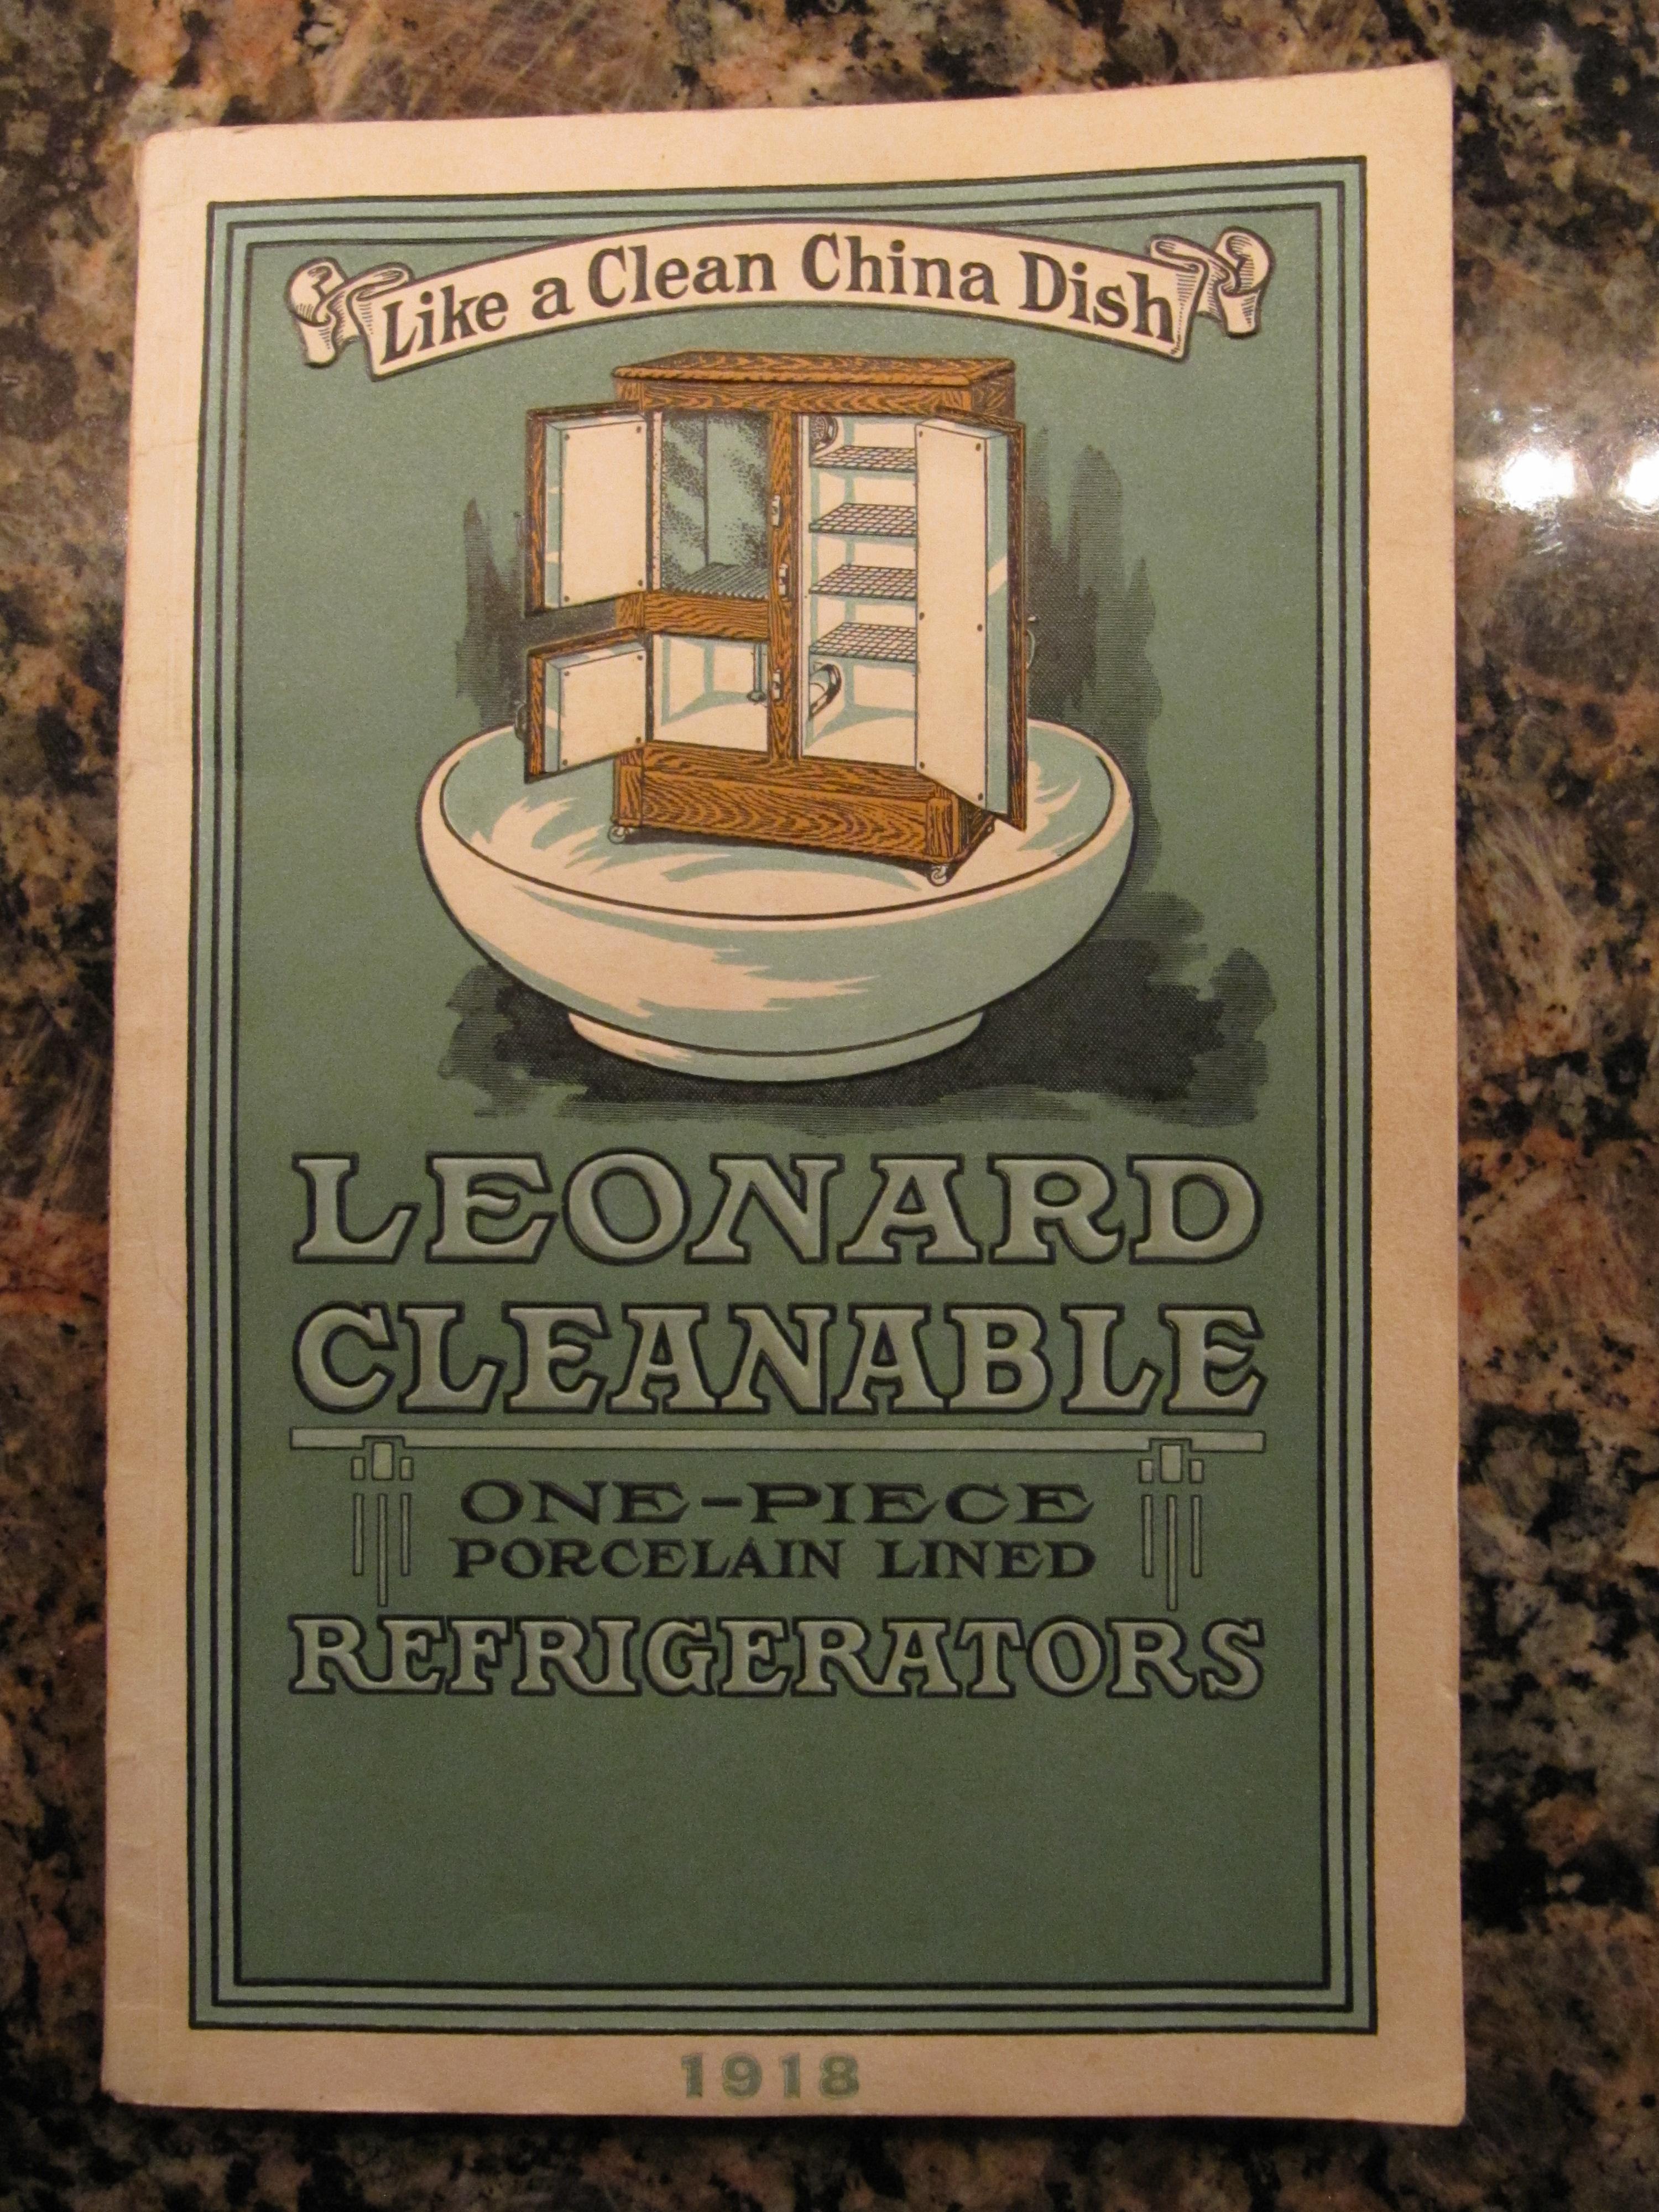 Leonard Refrigerators1918